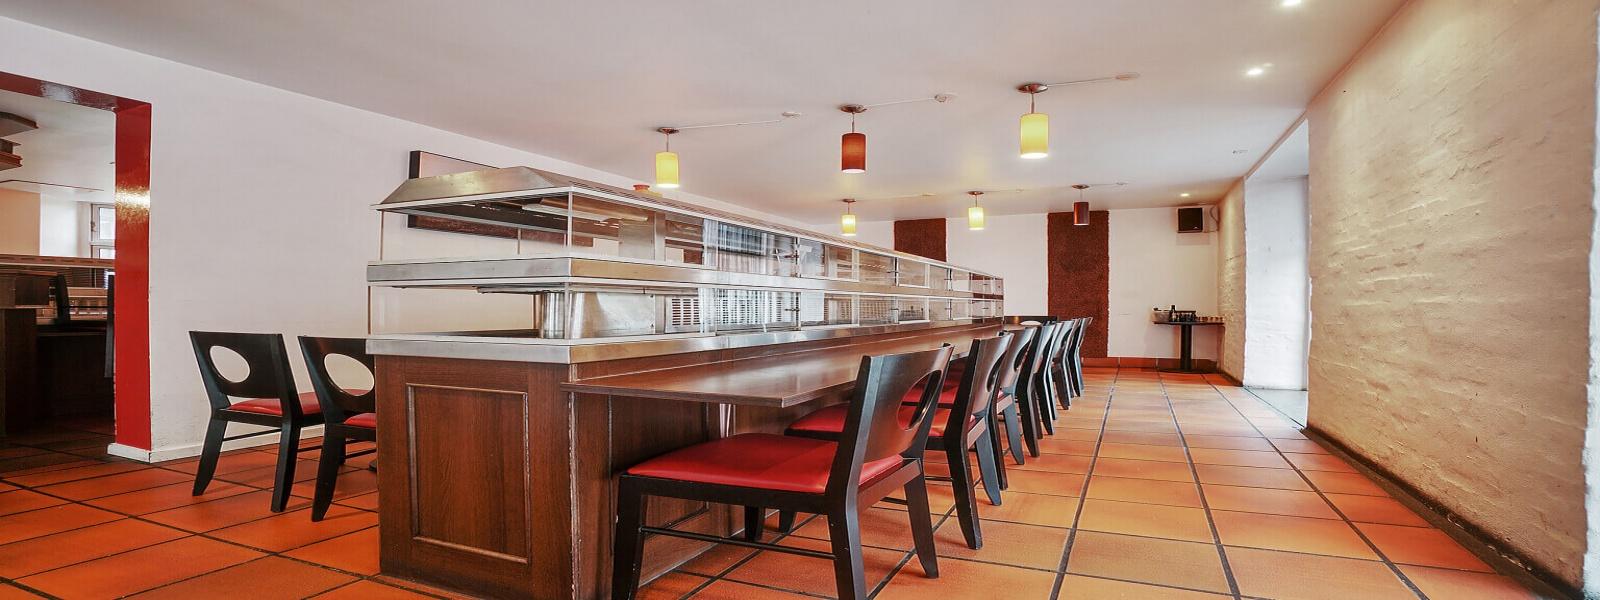 Restaurant,Solgt,1266